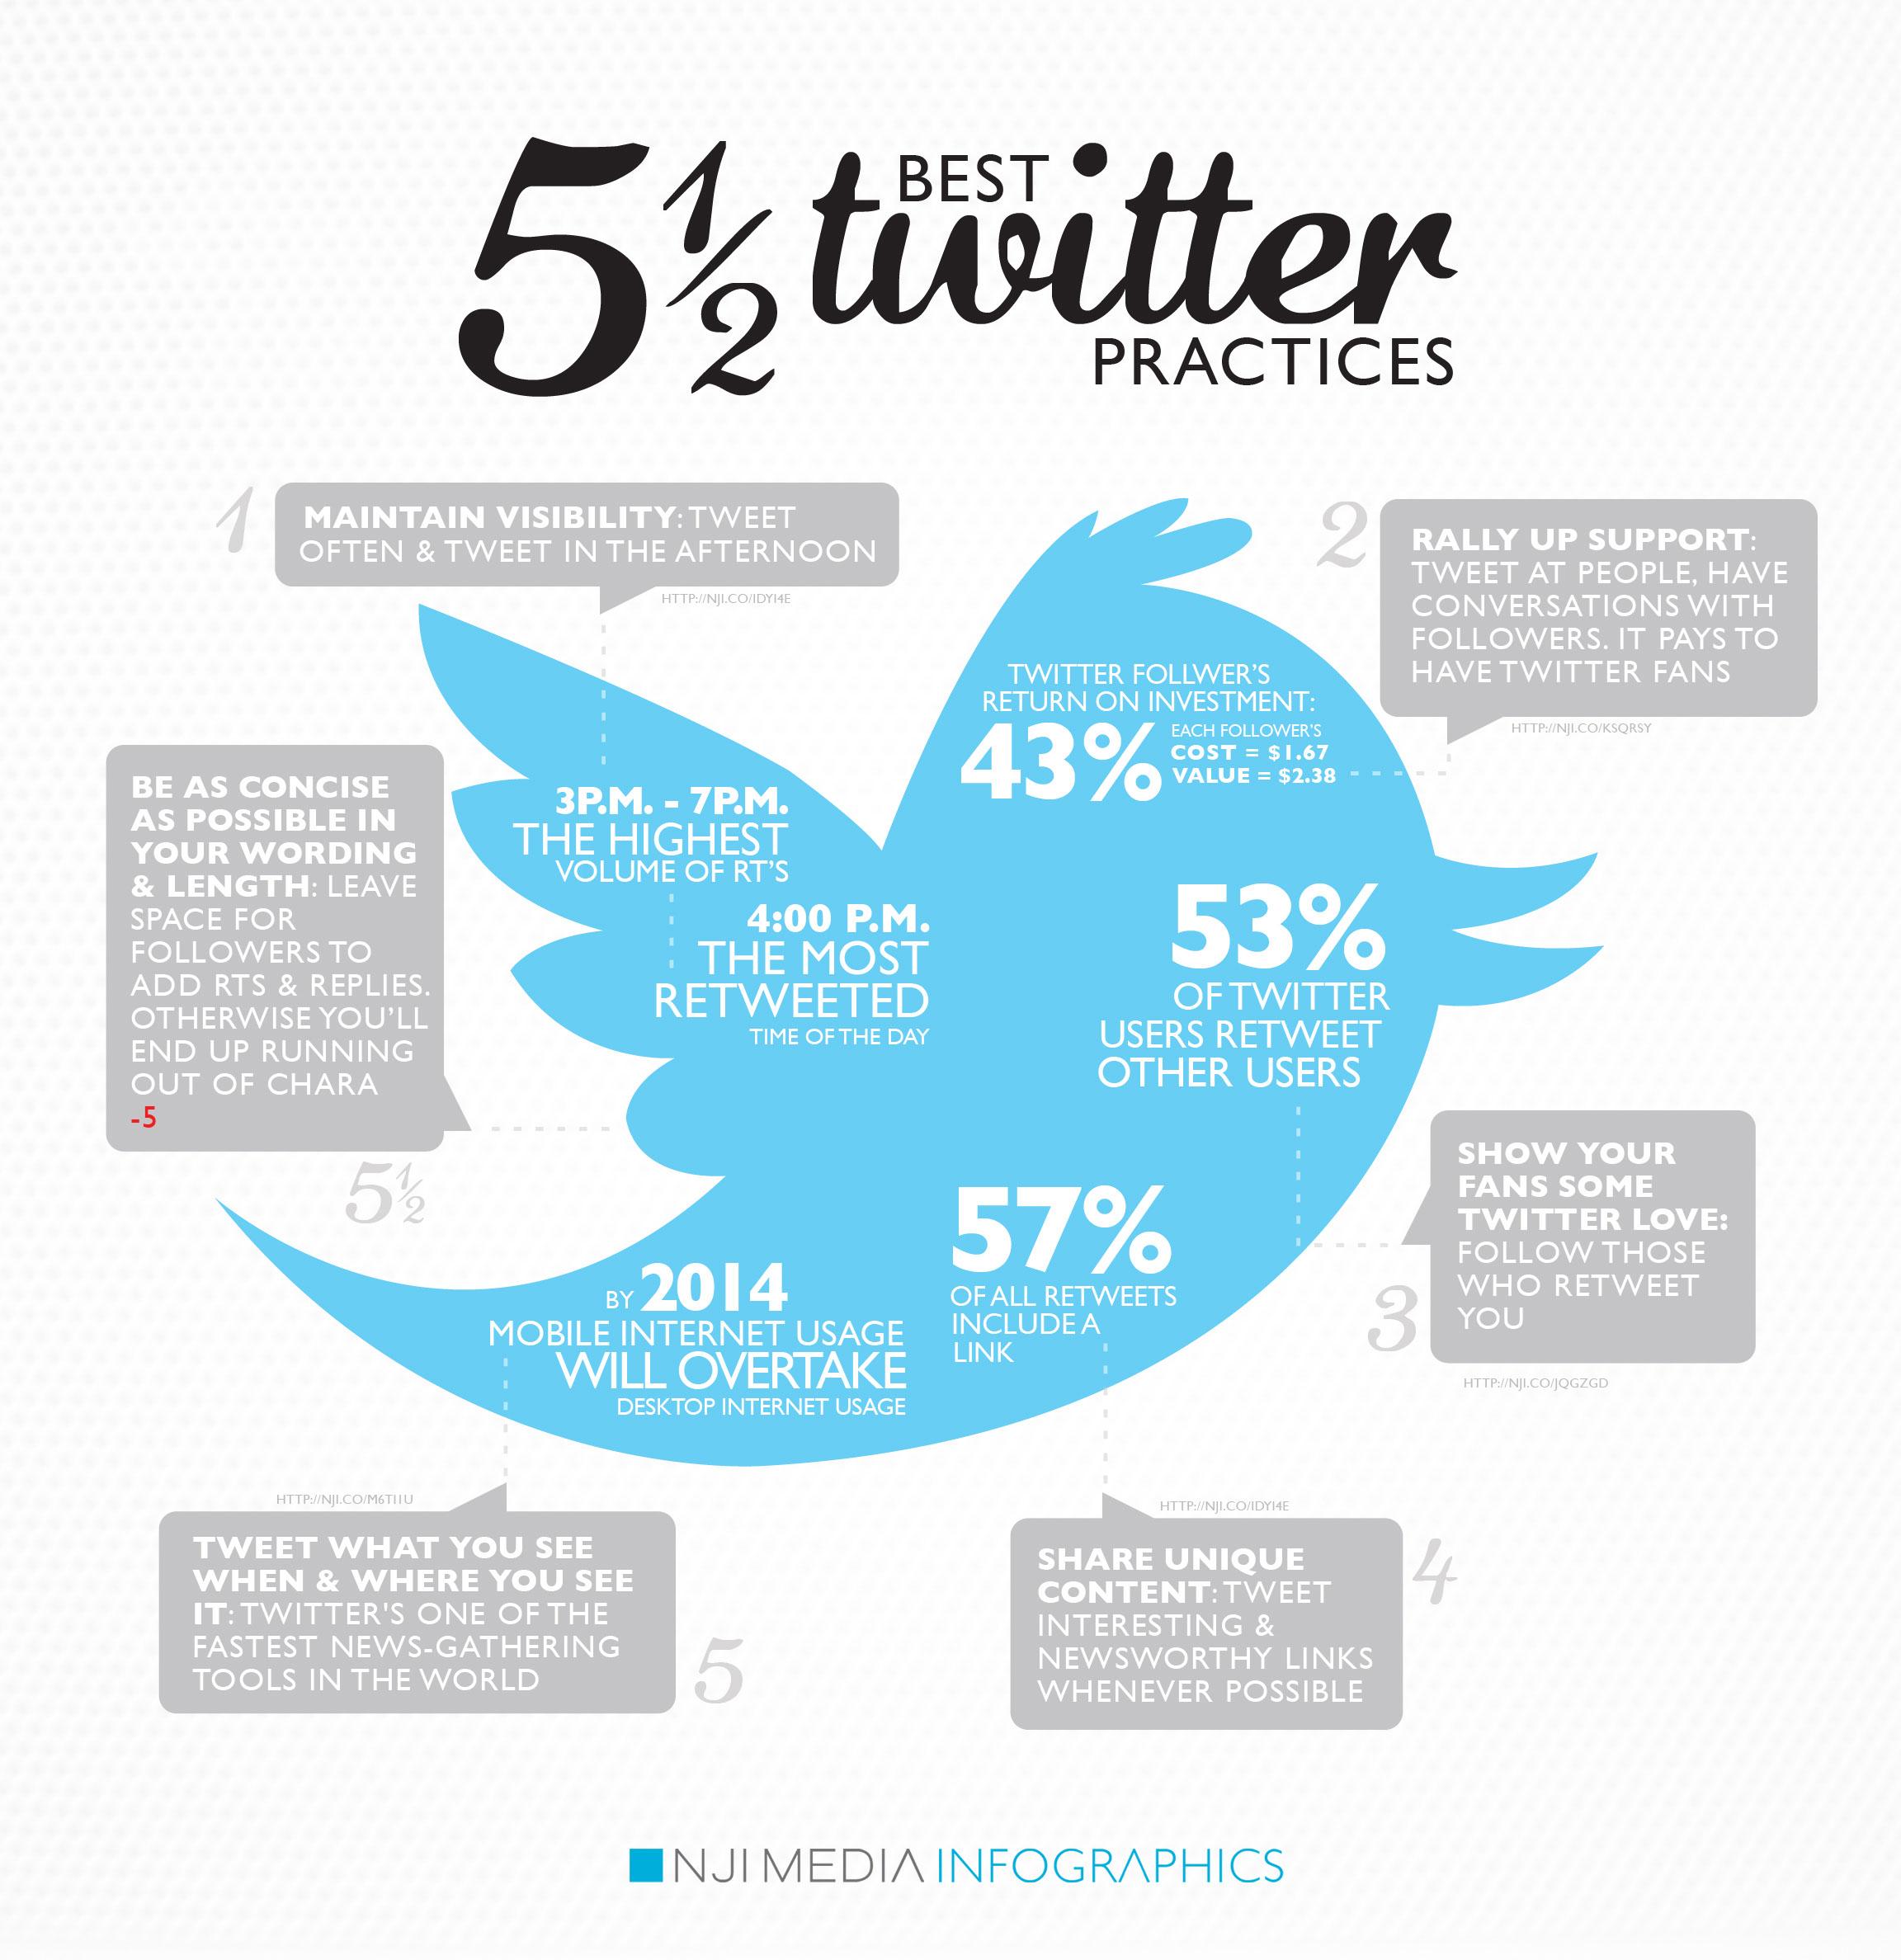 5½-Best-Twitter-Practices-Infographic